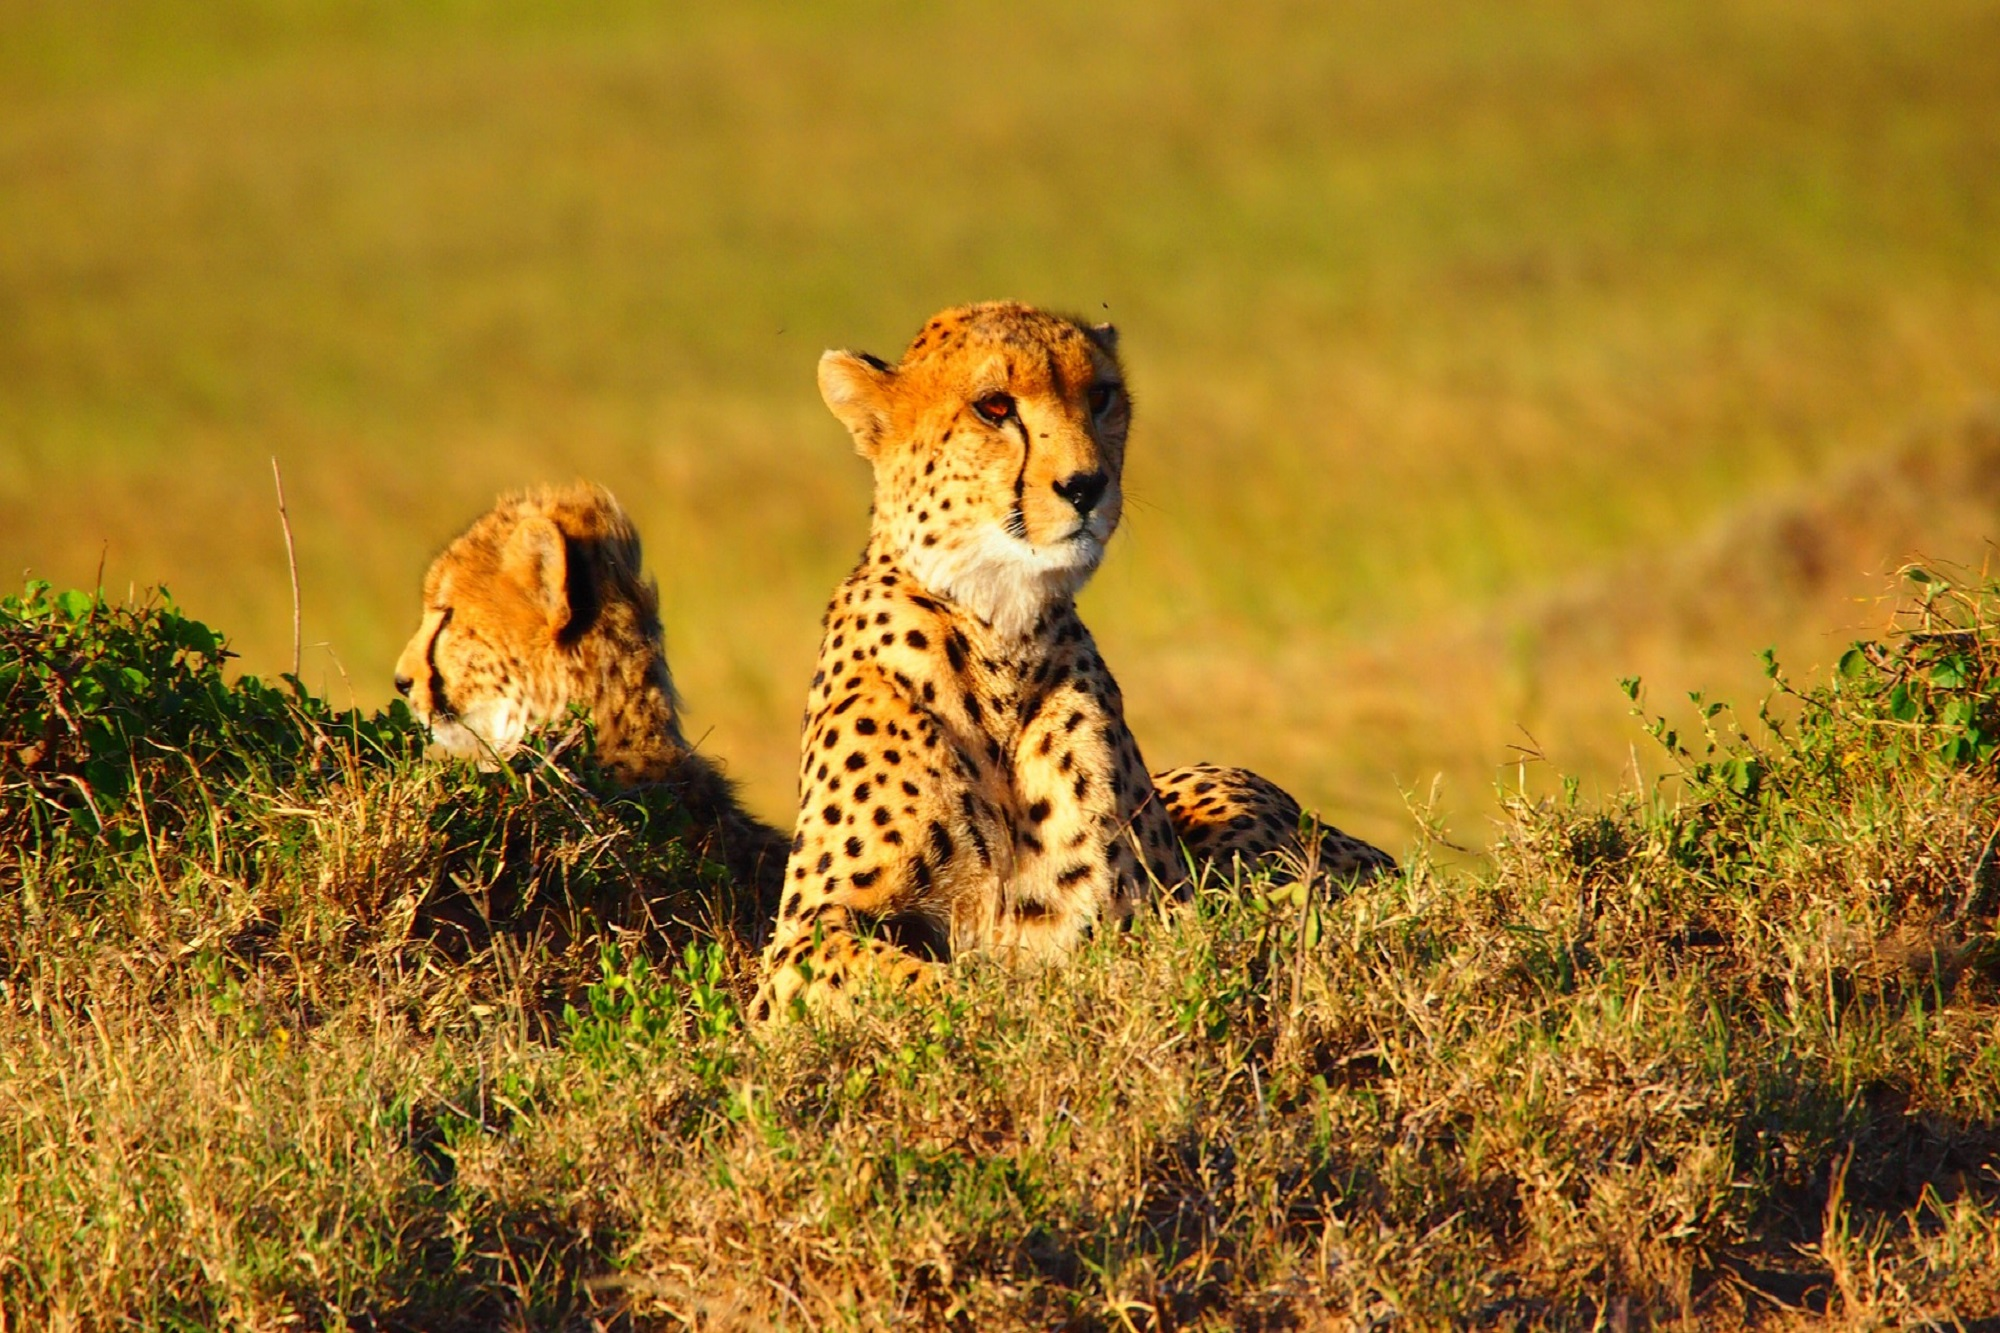 cheetah-737417_1920